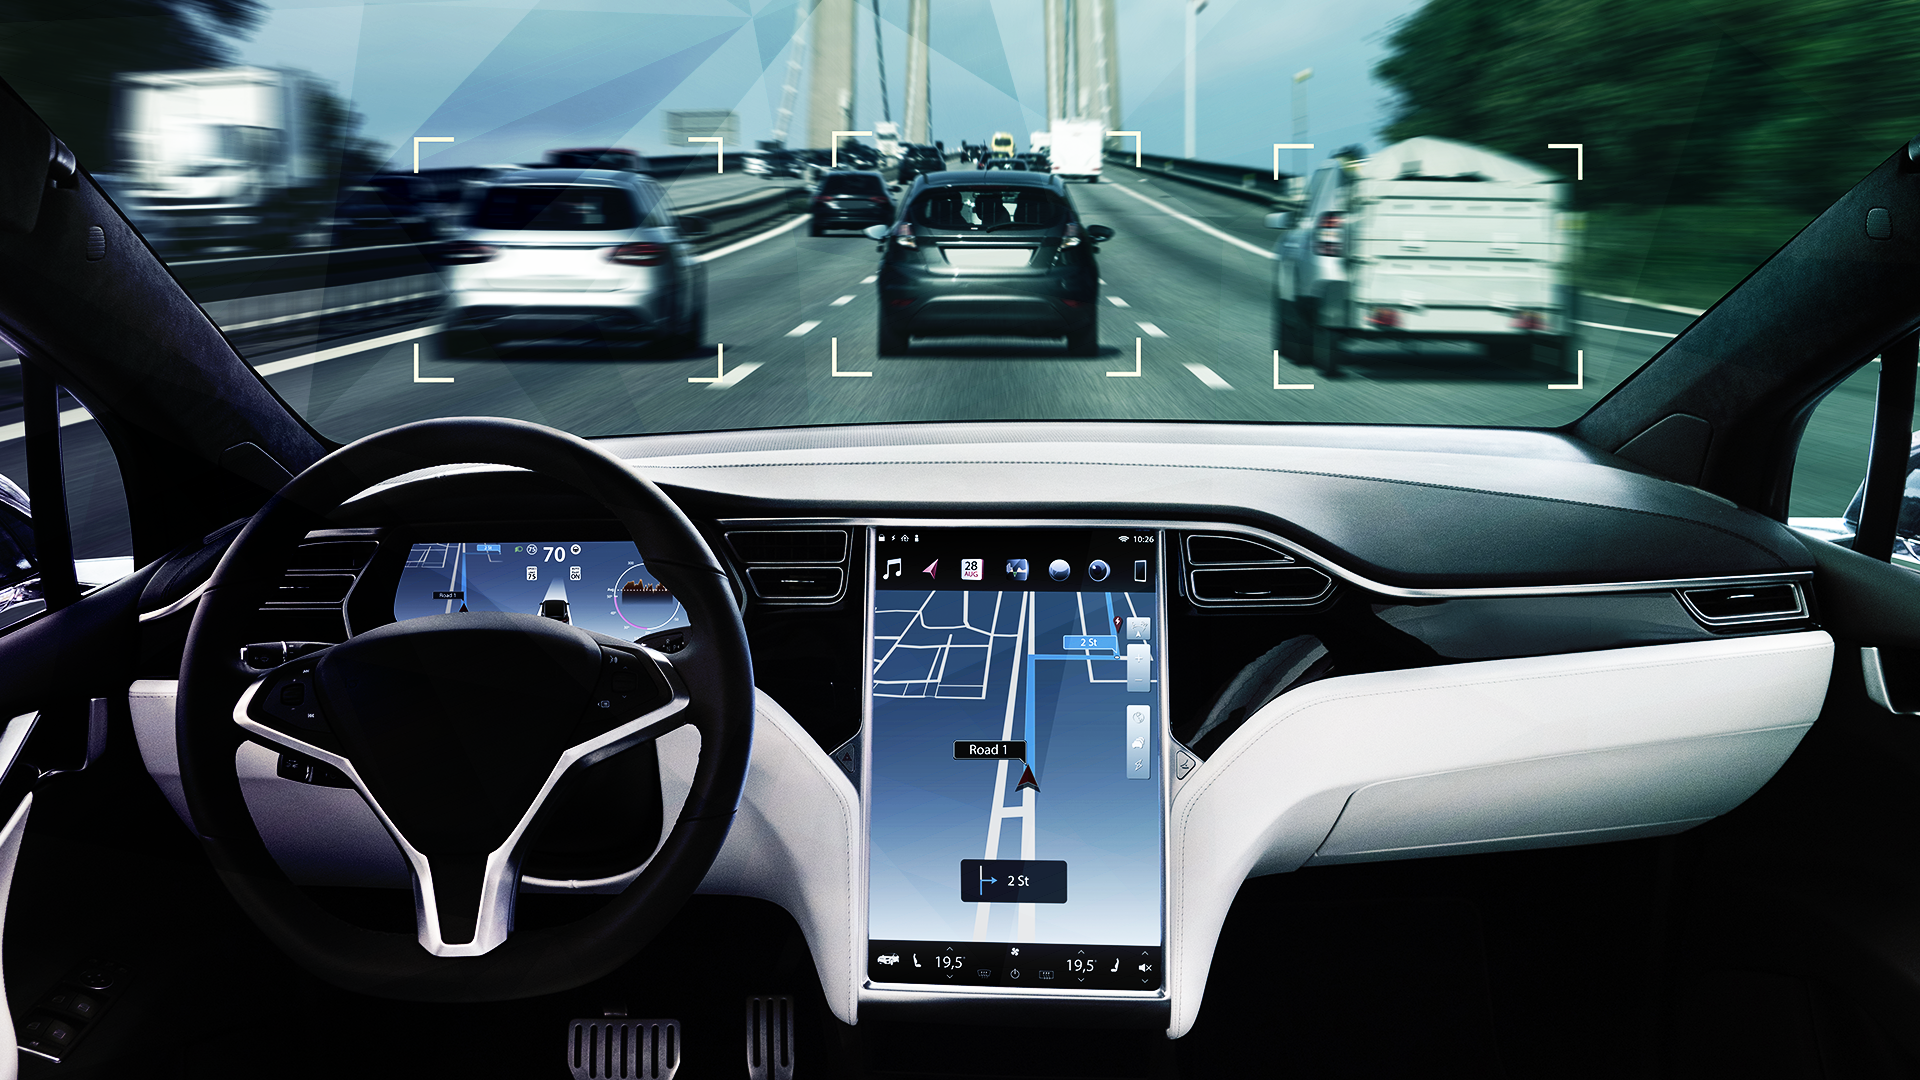 Auto, Elektroautos, tesla, Tesla Motors, Elektroauto, E-Auto, Selbstfahrendes Auto, Autonomes Auto, Selbstfahrend, Verkehr, Autopilot, Model 3, autonomes Fahren, Tesla Model 3, Autobahn, Tesla Model S